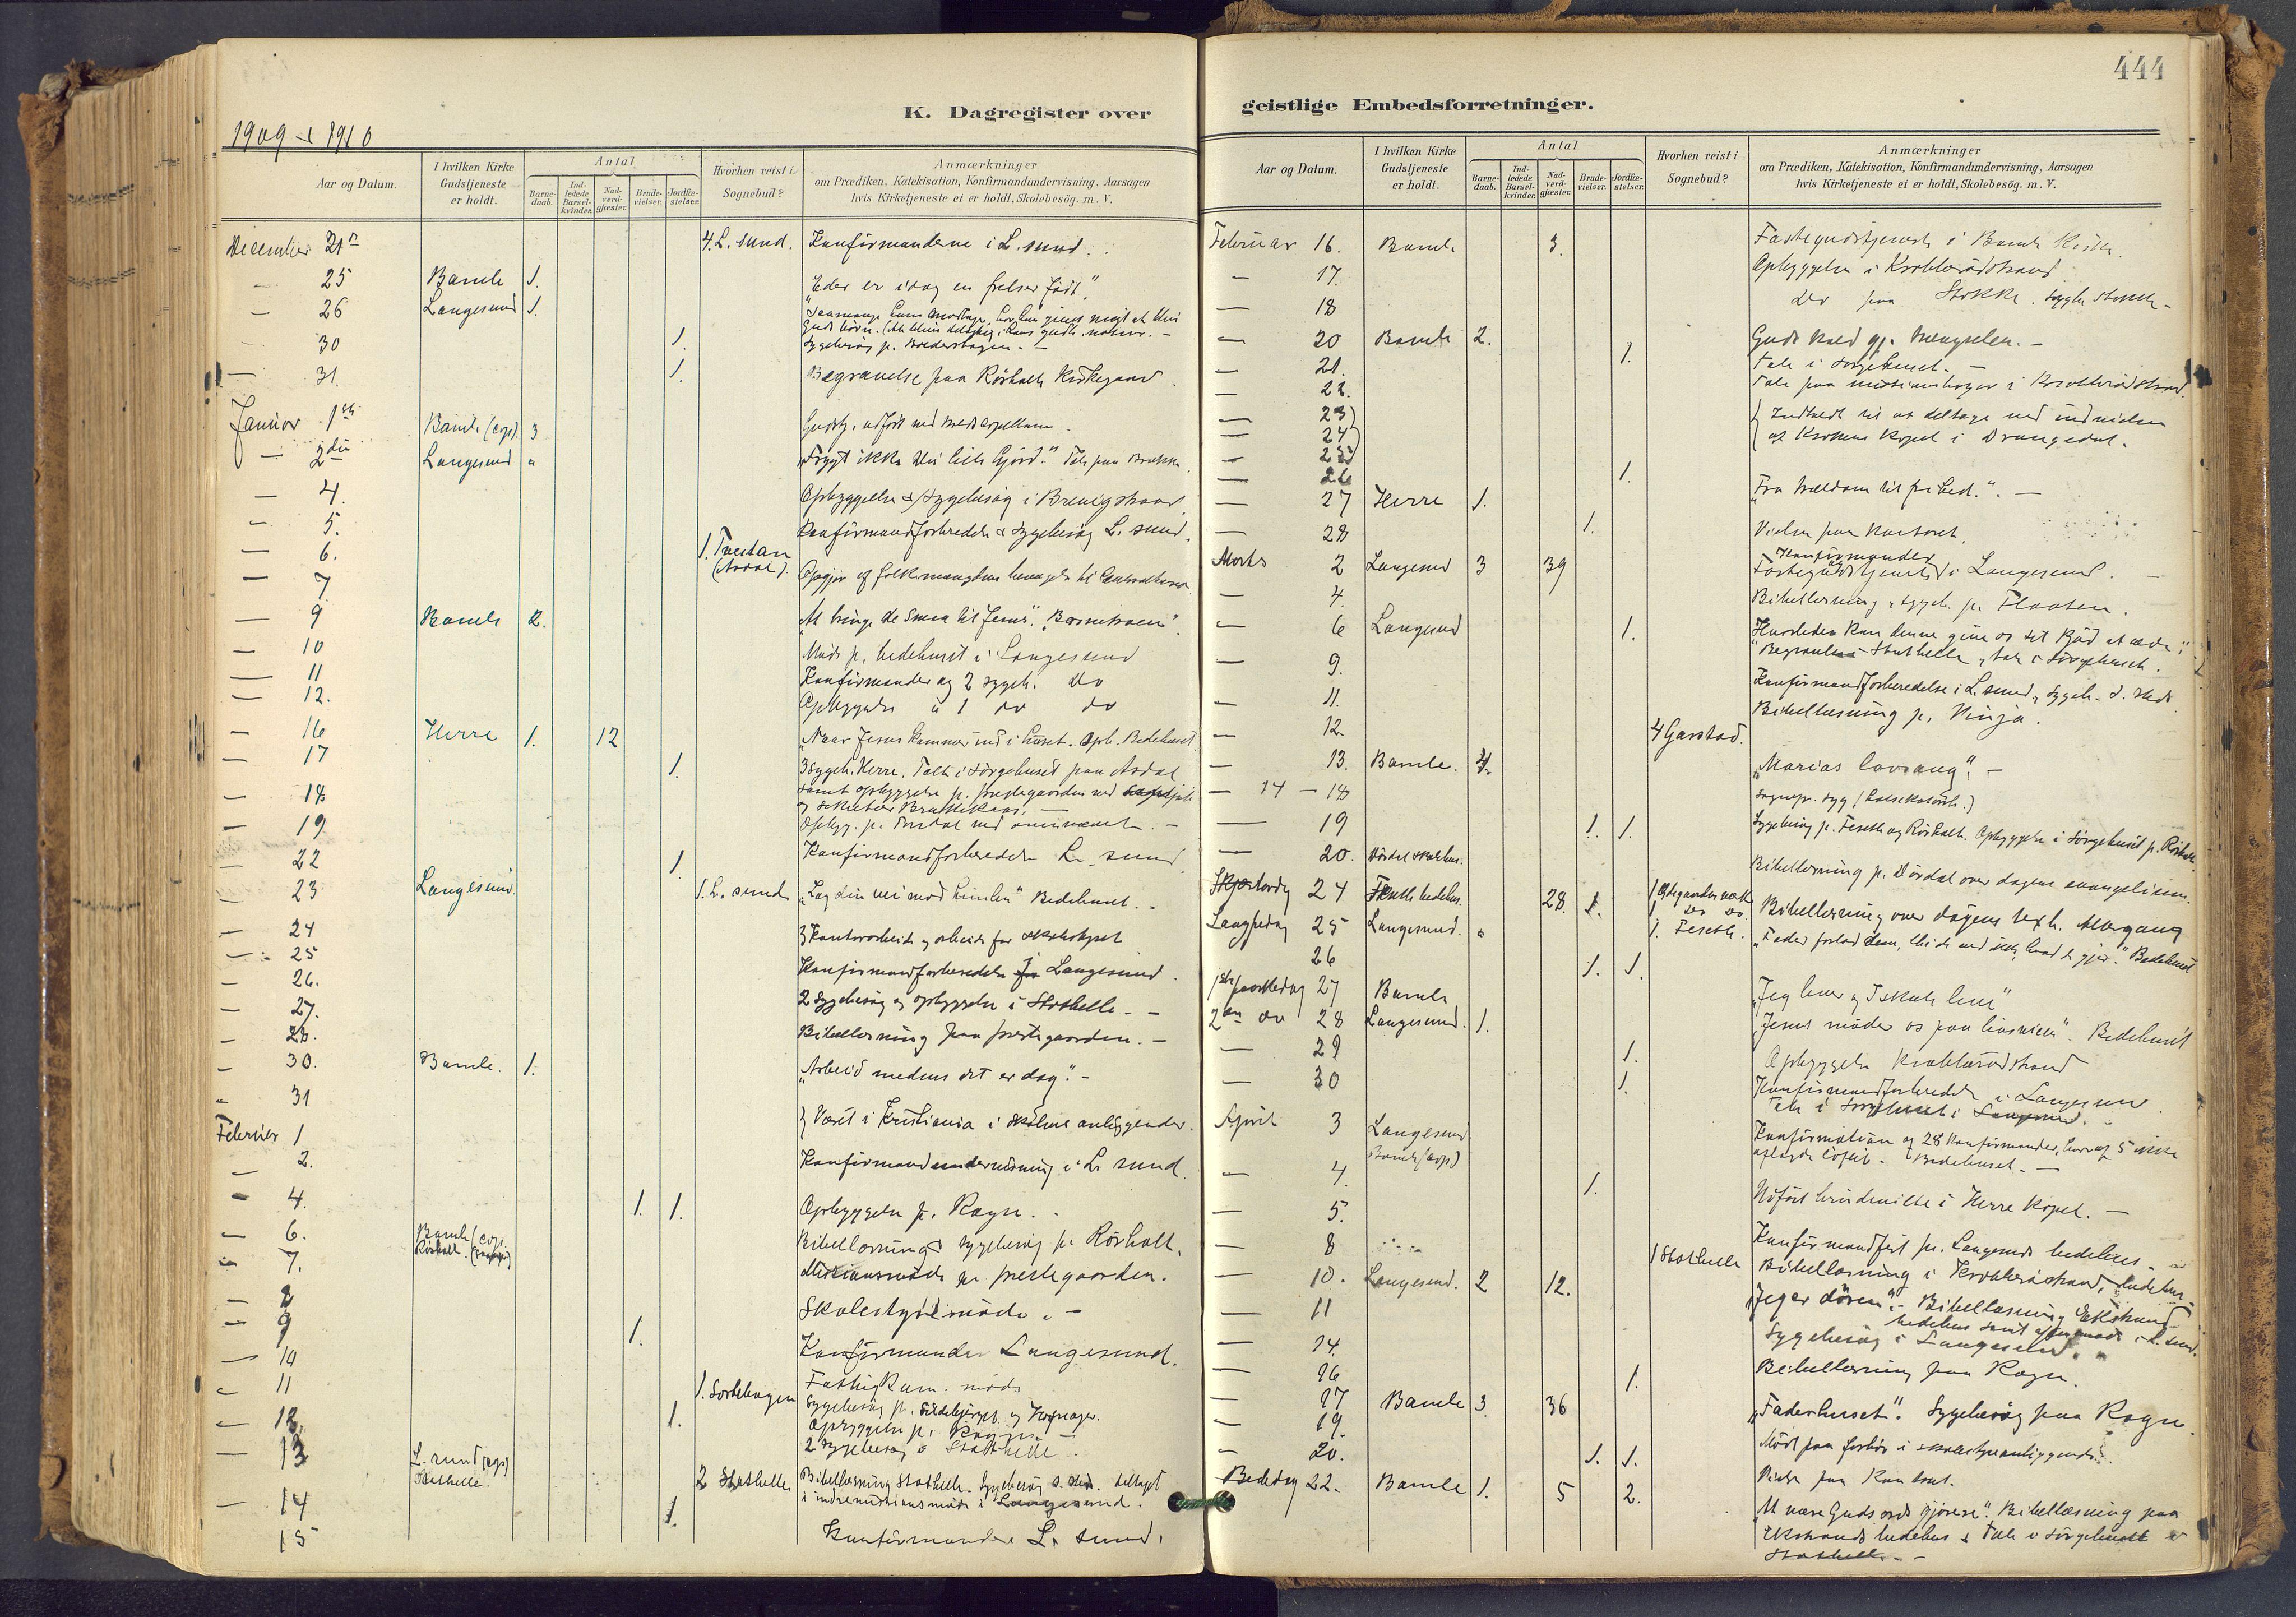 SAKO, Bamble kirkebøker, F/Fa/L0009: Ministerialbok nr. I 9, 1901-1917, s. 444